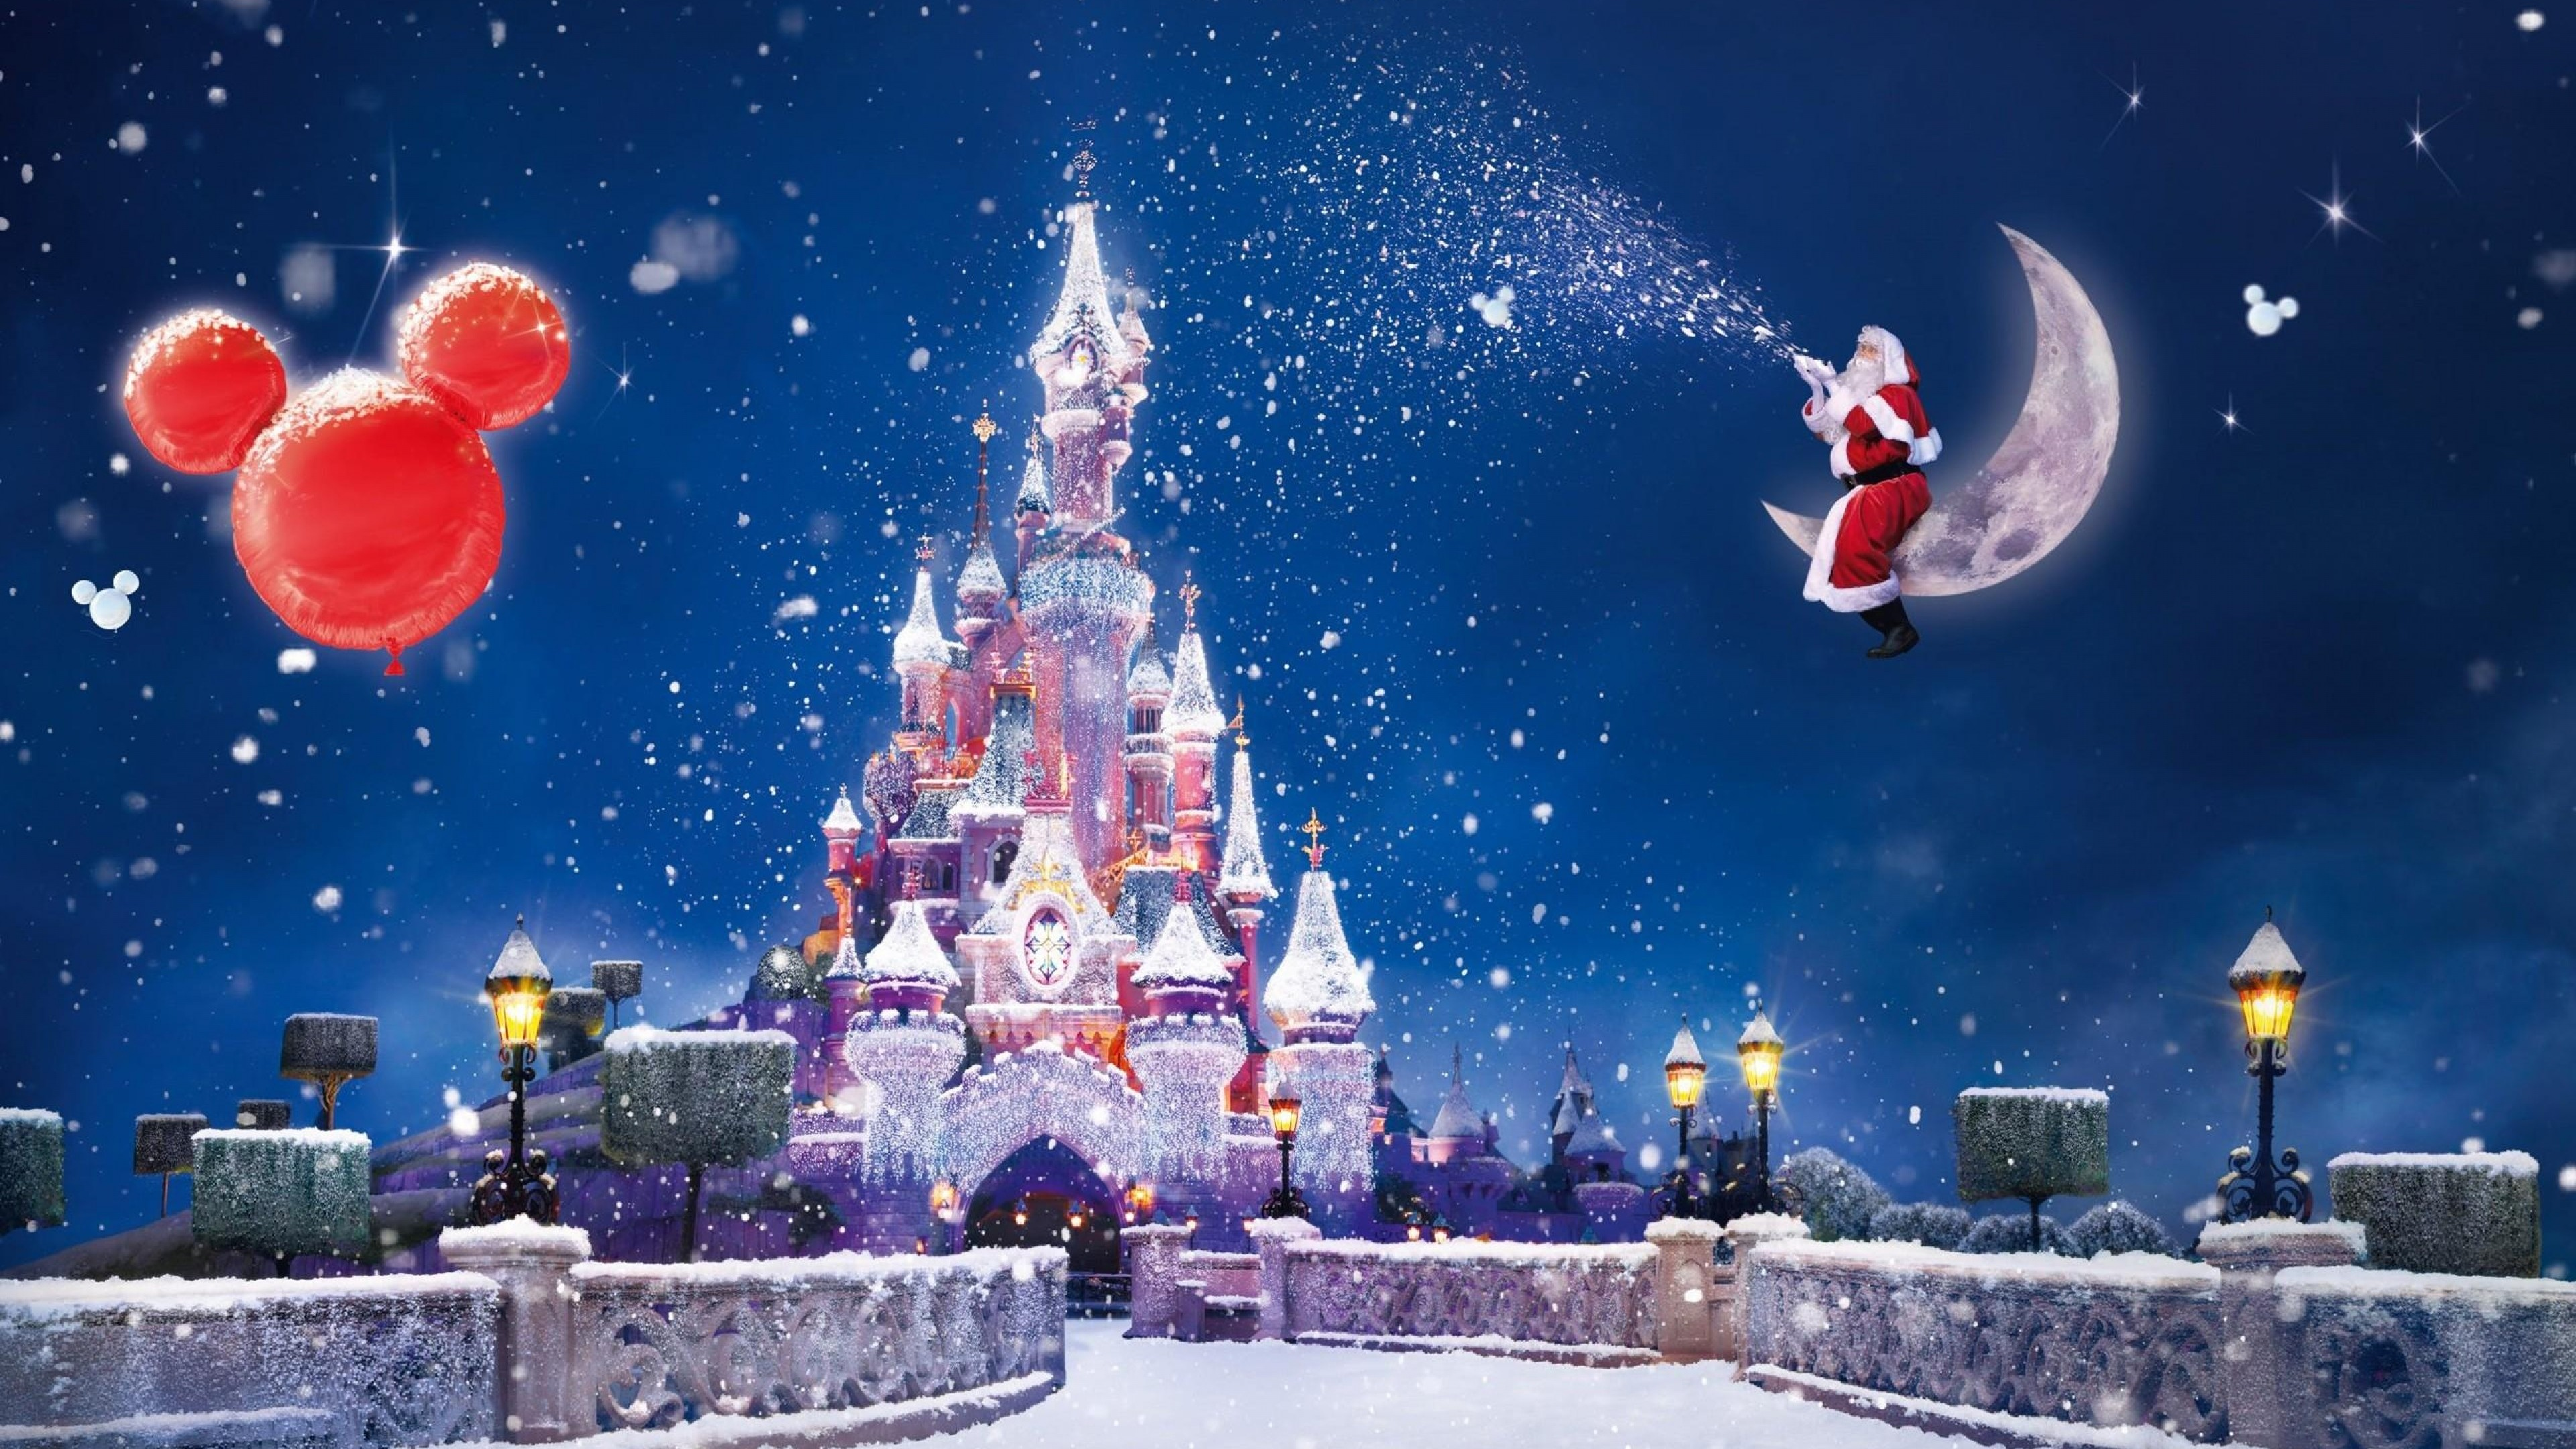 … Christmas Wallpaper, Background 4K Ultra HD. Wallpaper santa  claus, magic, moon, snow, castle, balloons, holiday